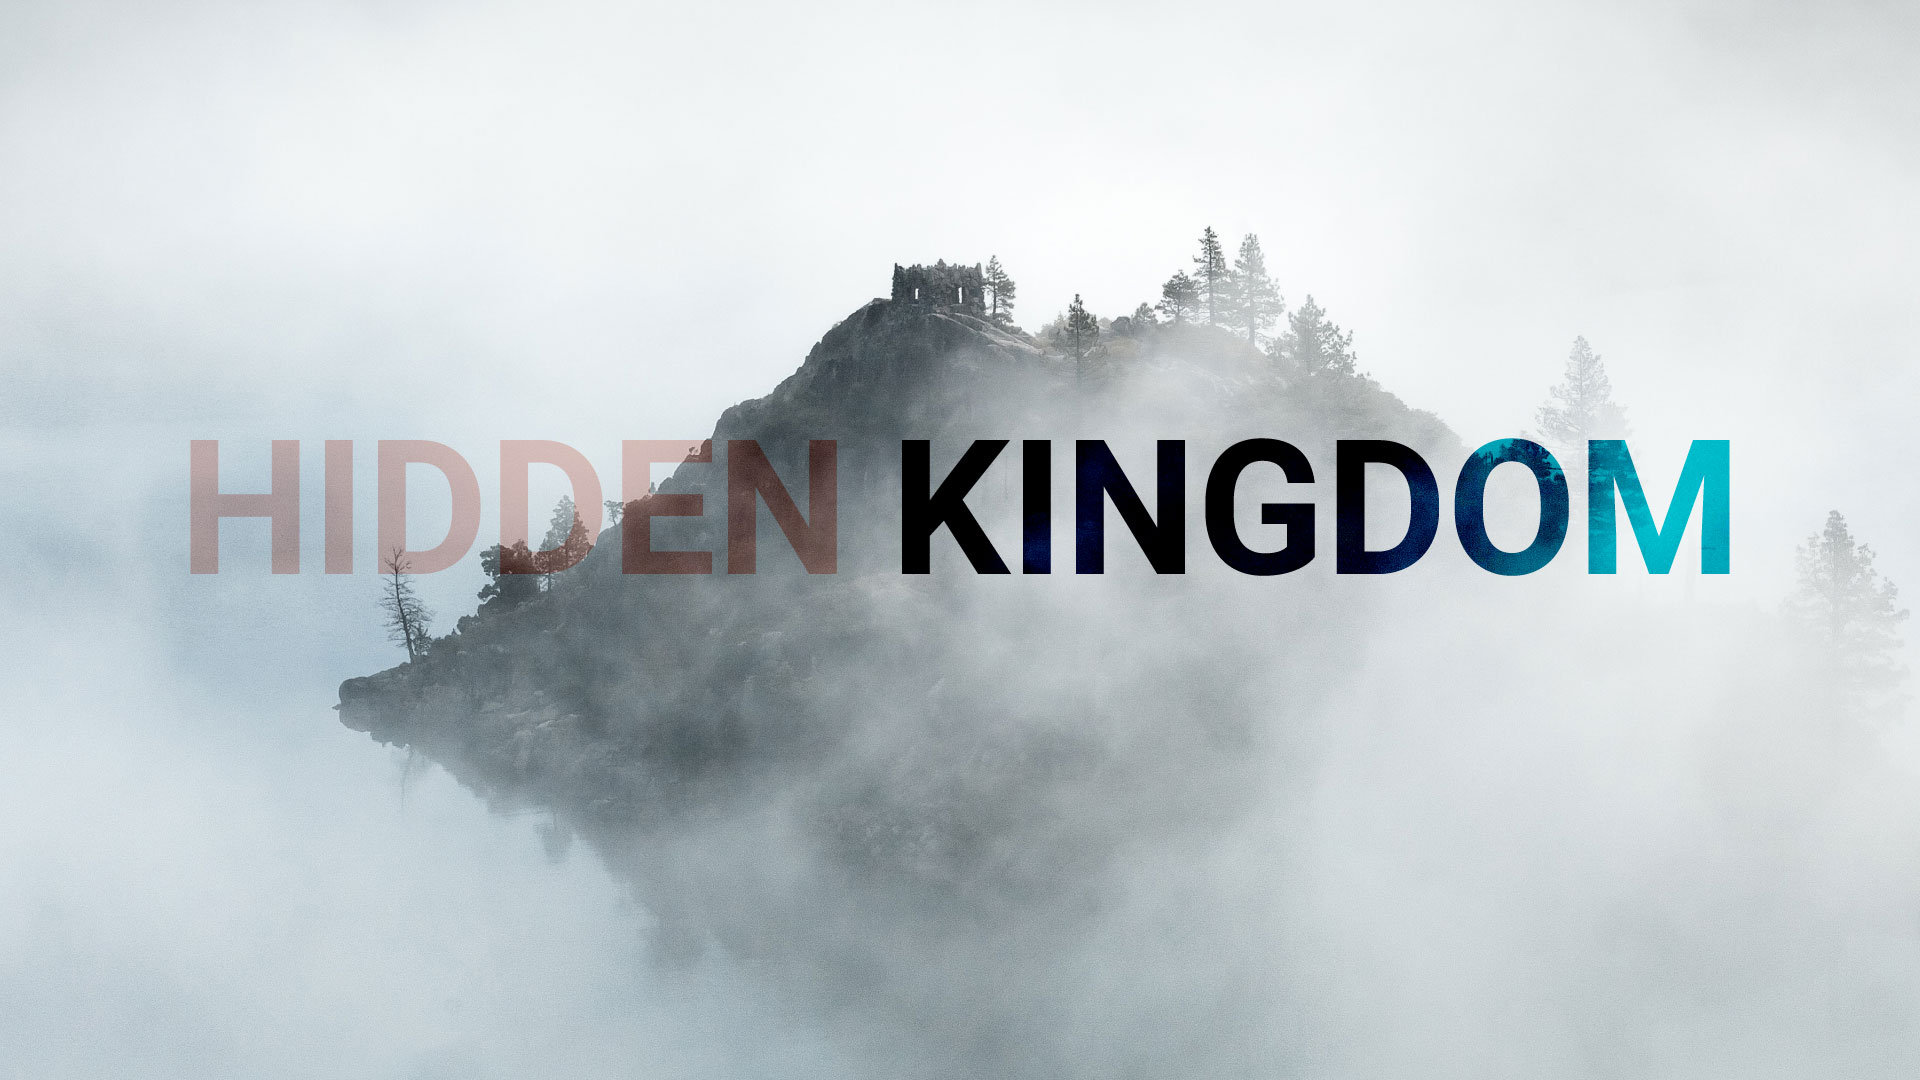 hidden-kingdom.jpg